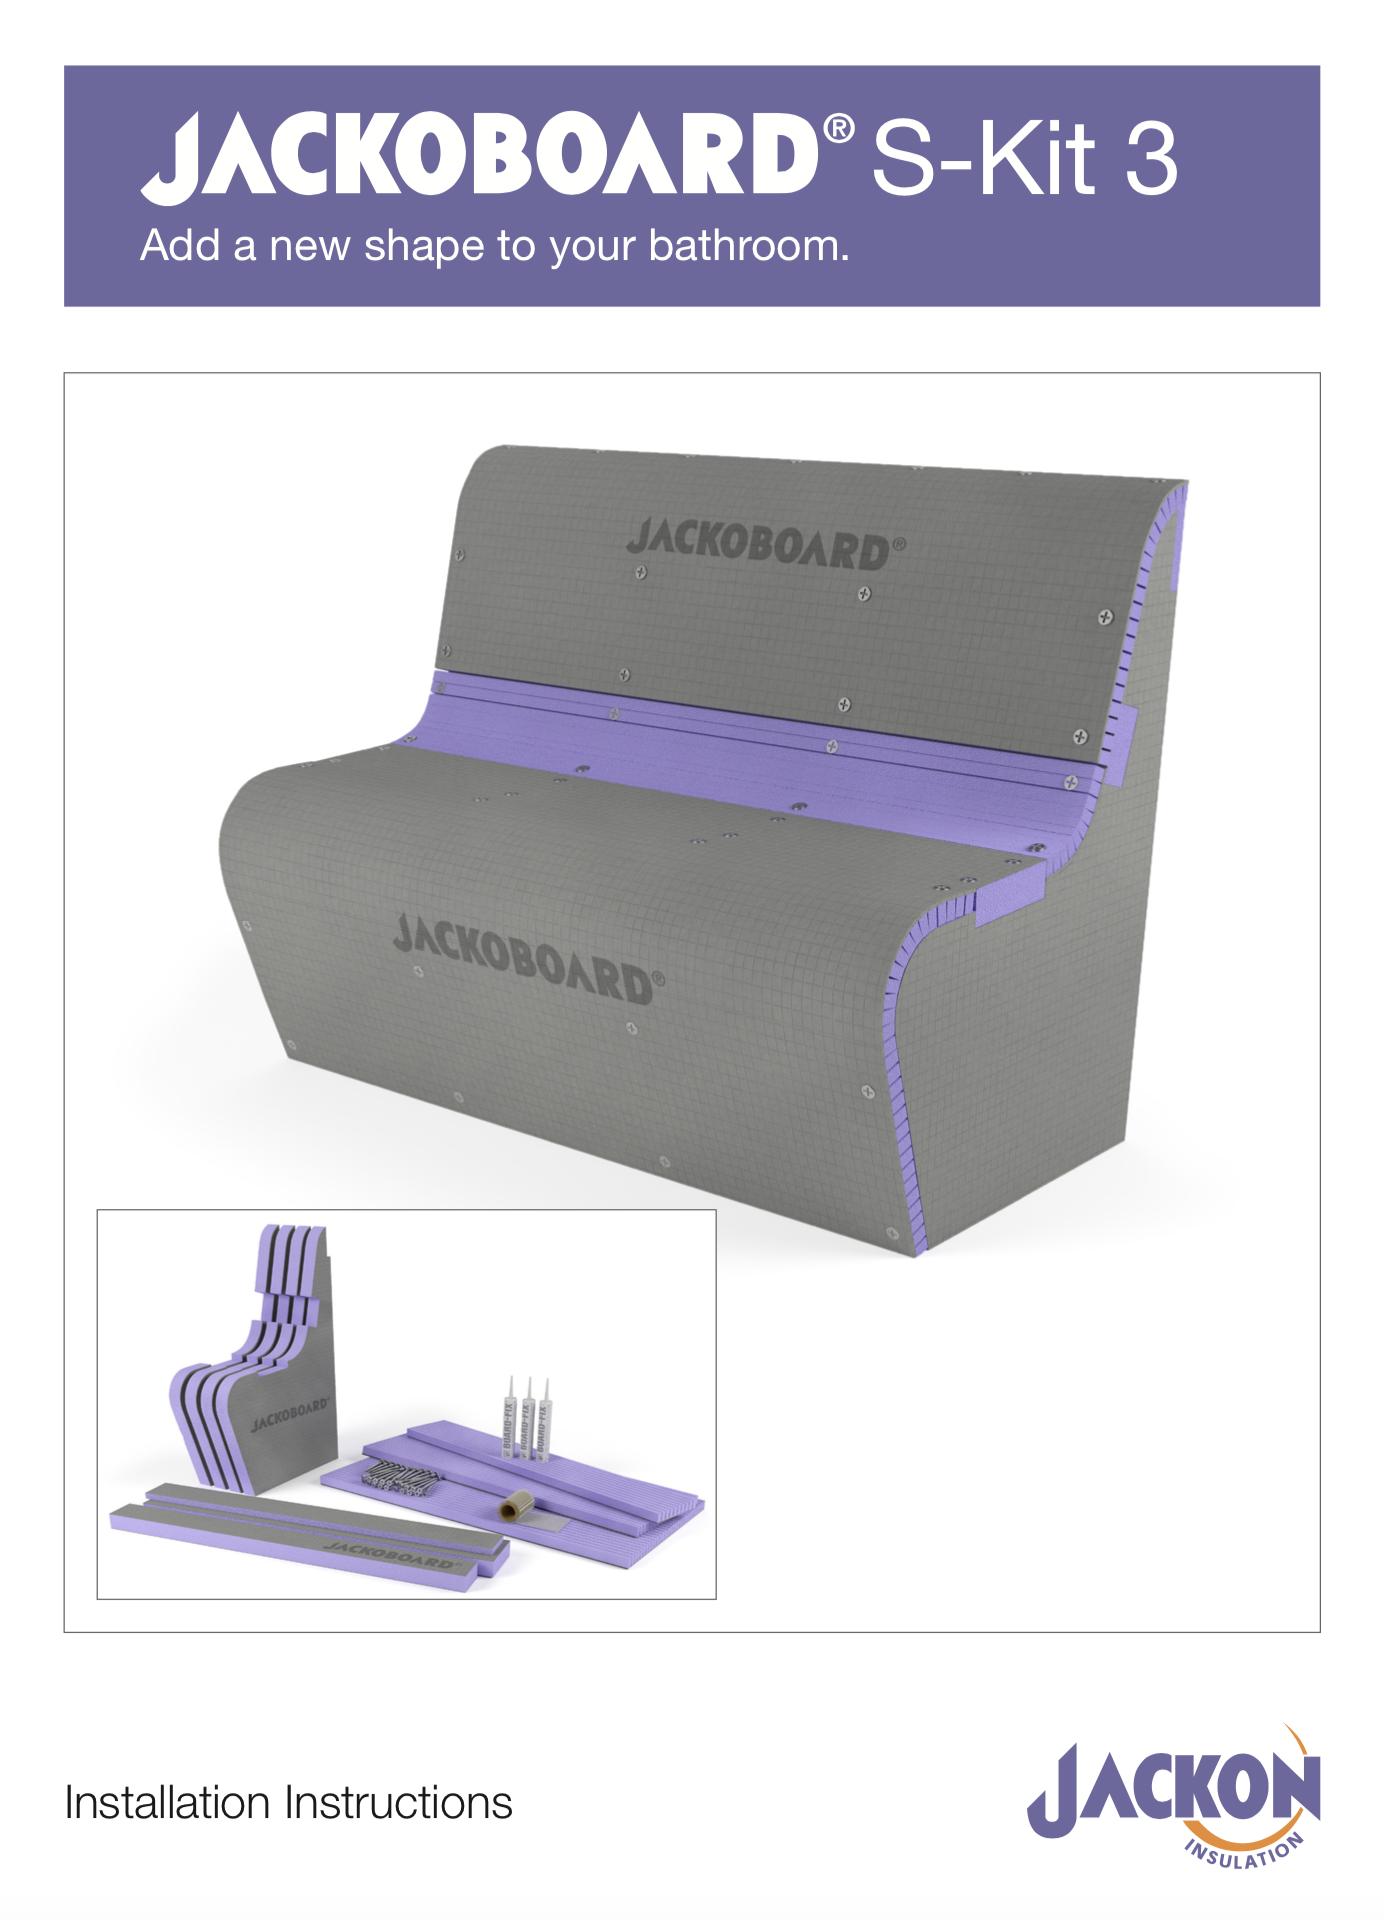 JACKOBOARD S-Kit 3 Curved Seat with Backrest